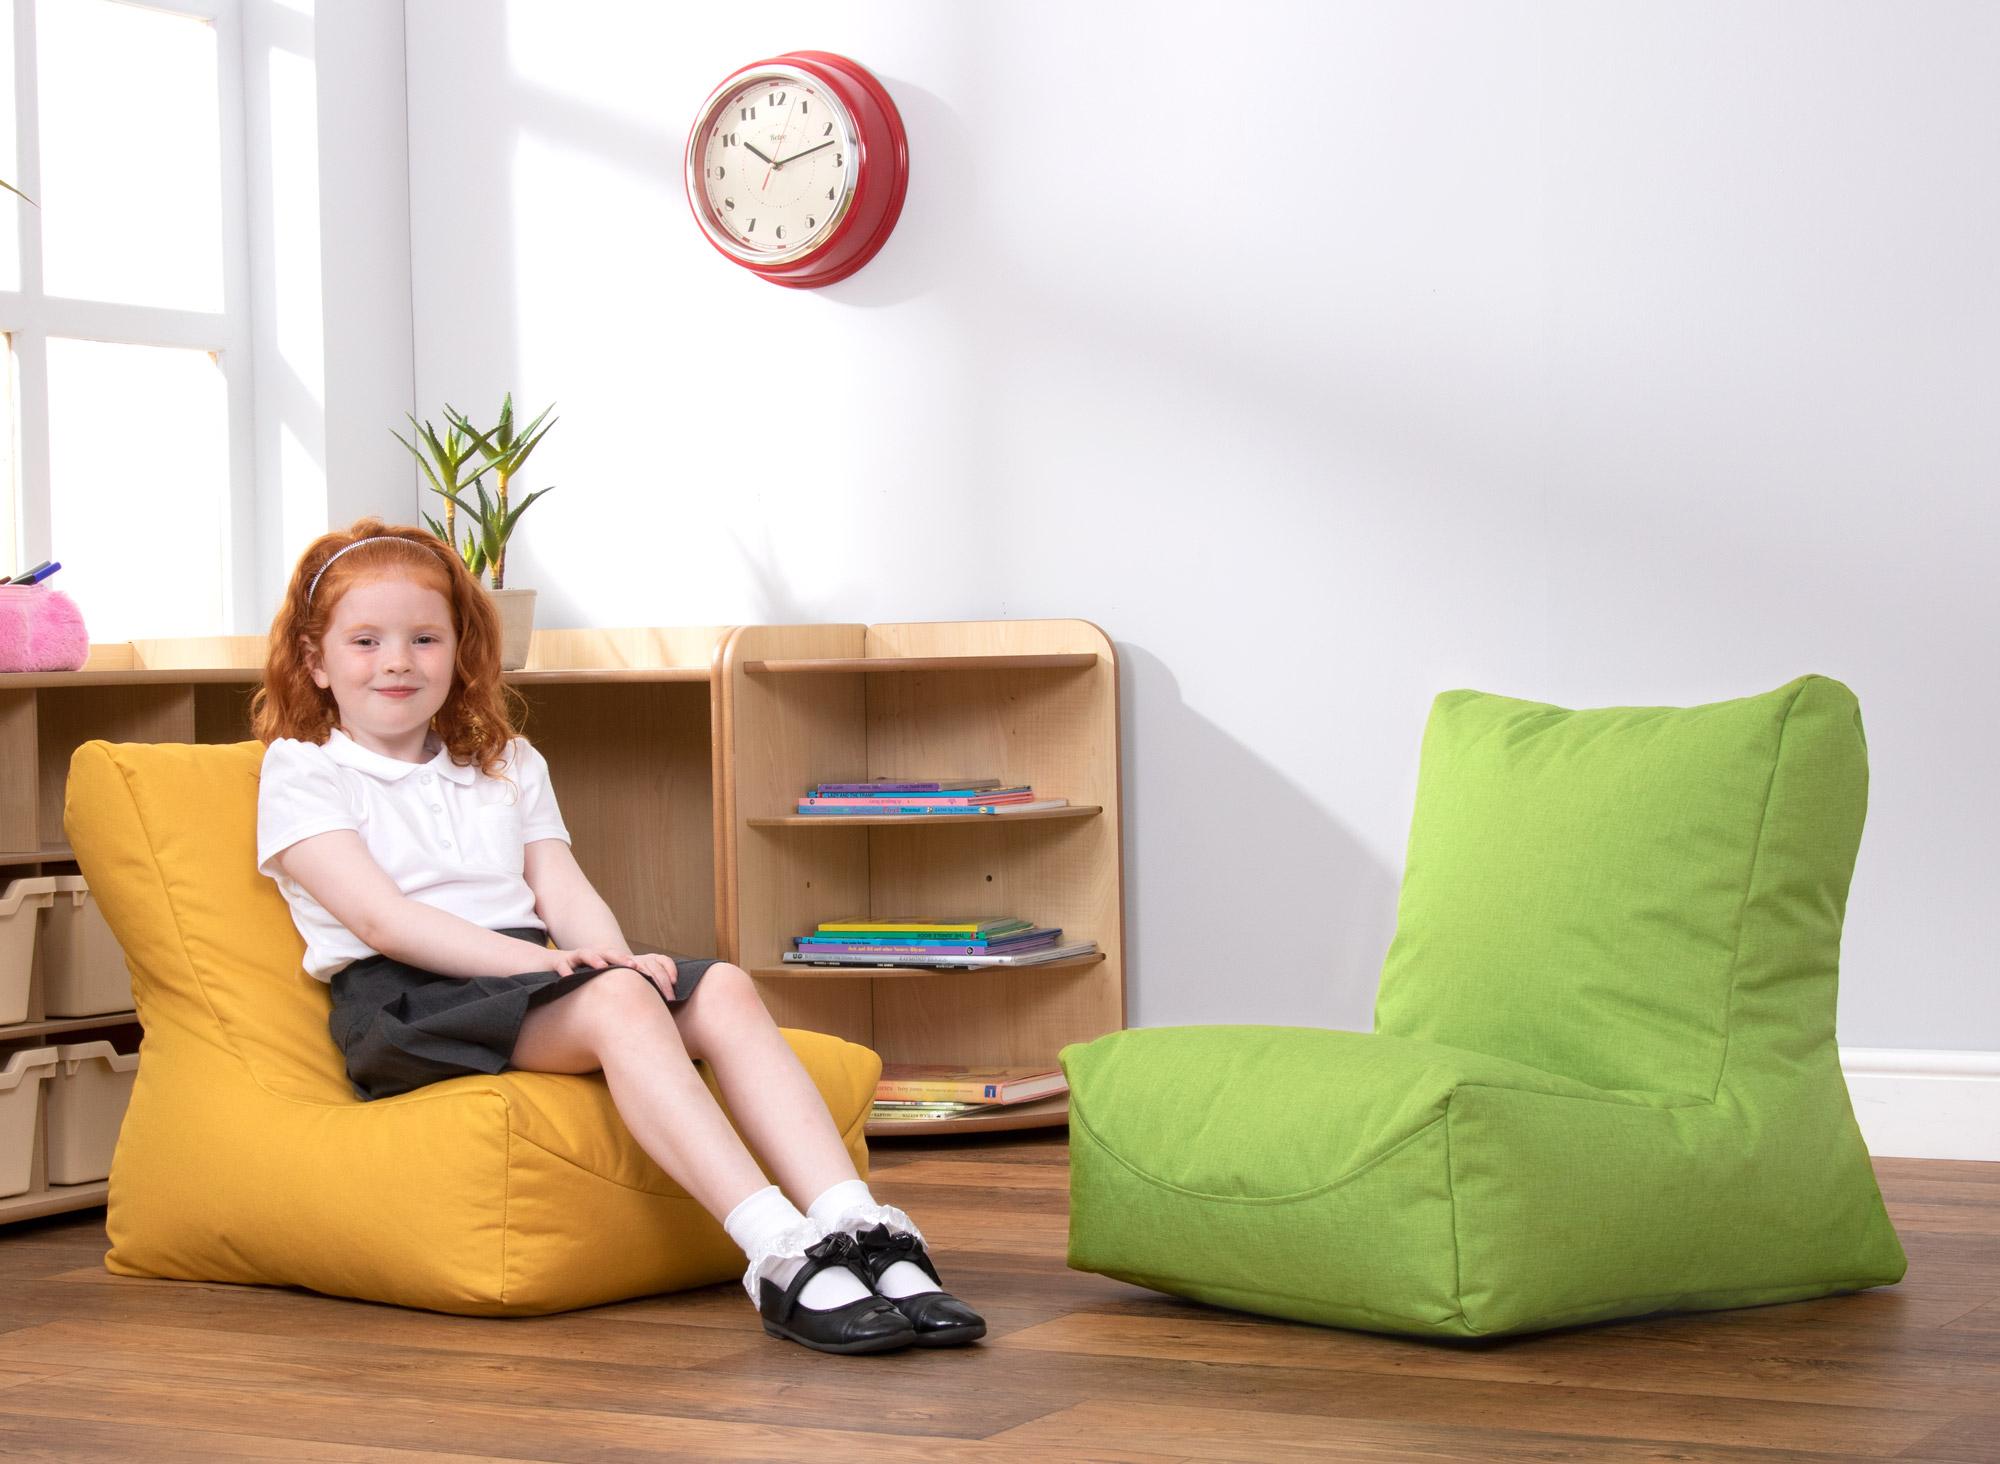 Eden-PRI-Smile-Chair-LF-1.jpg